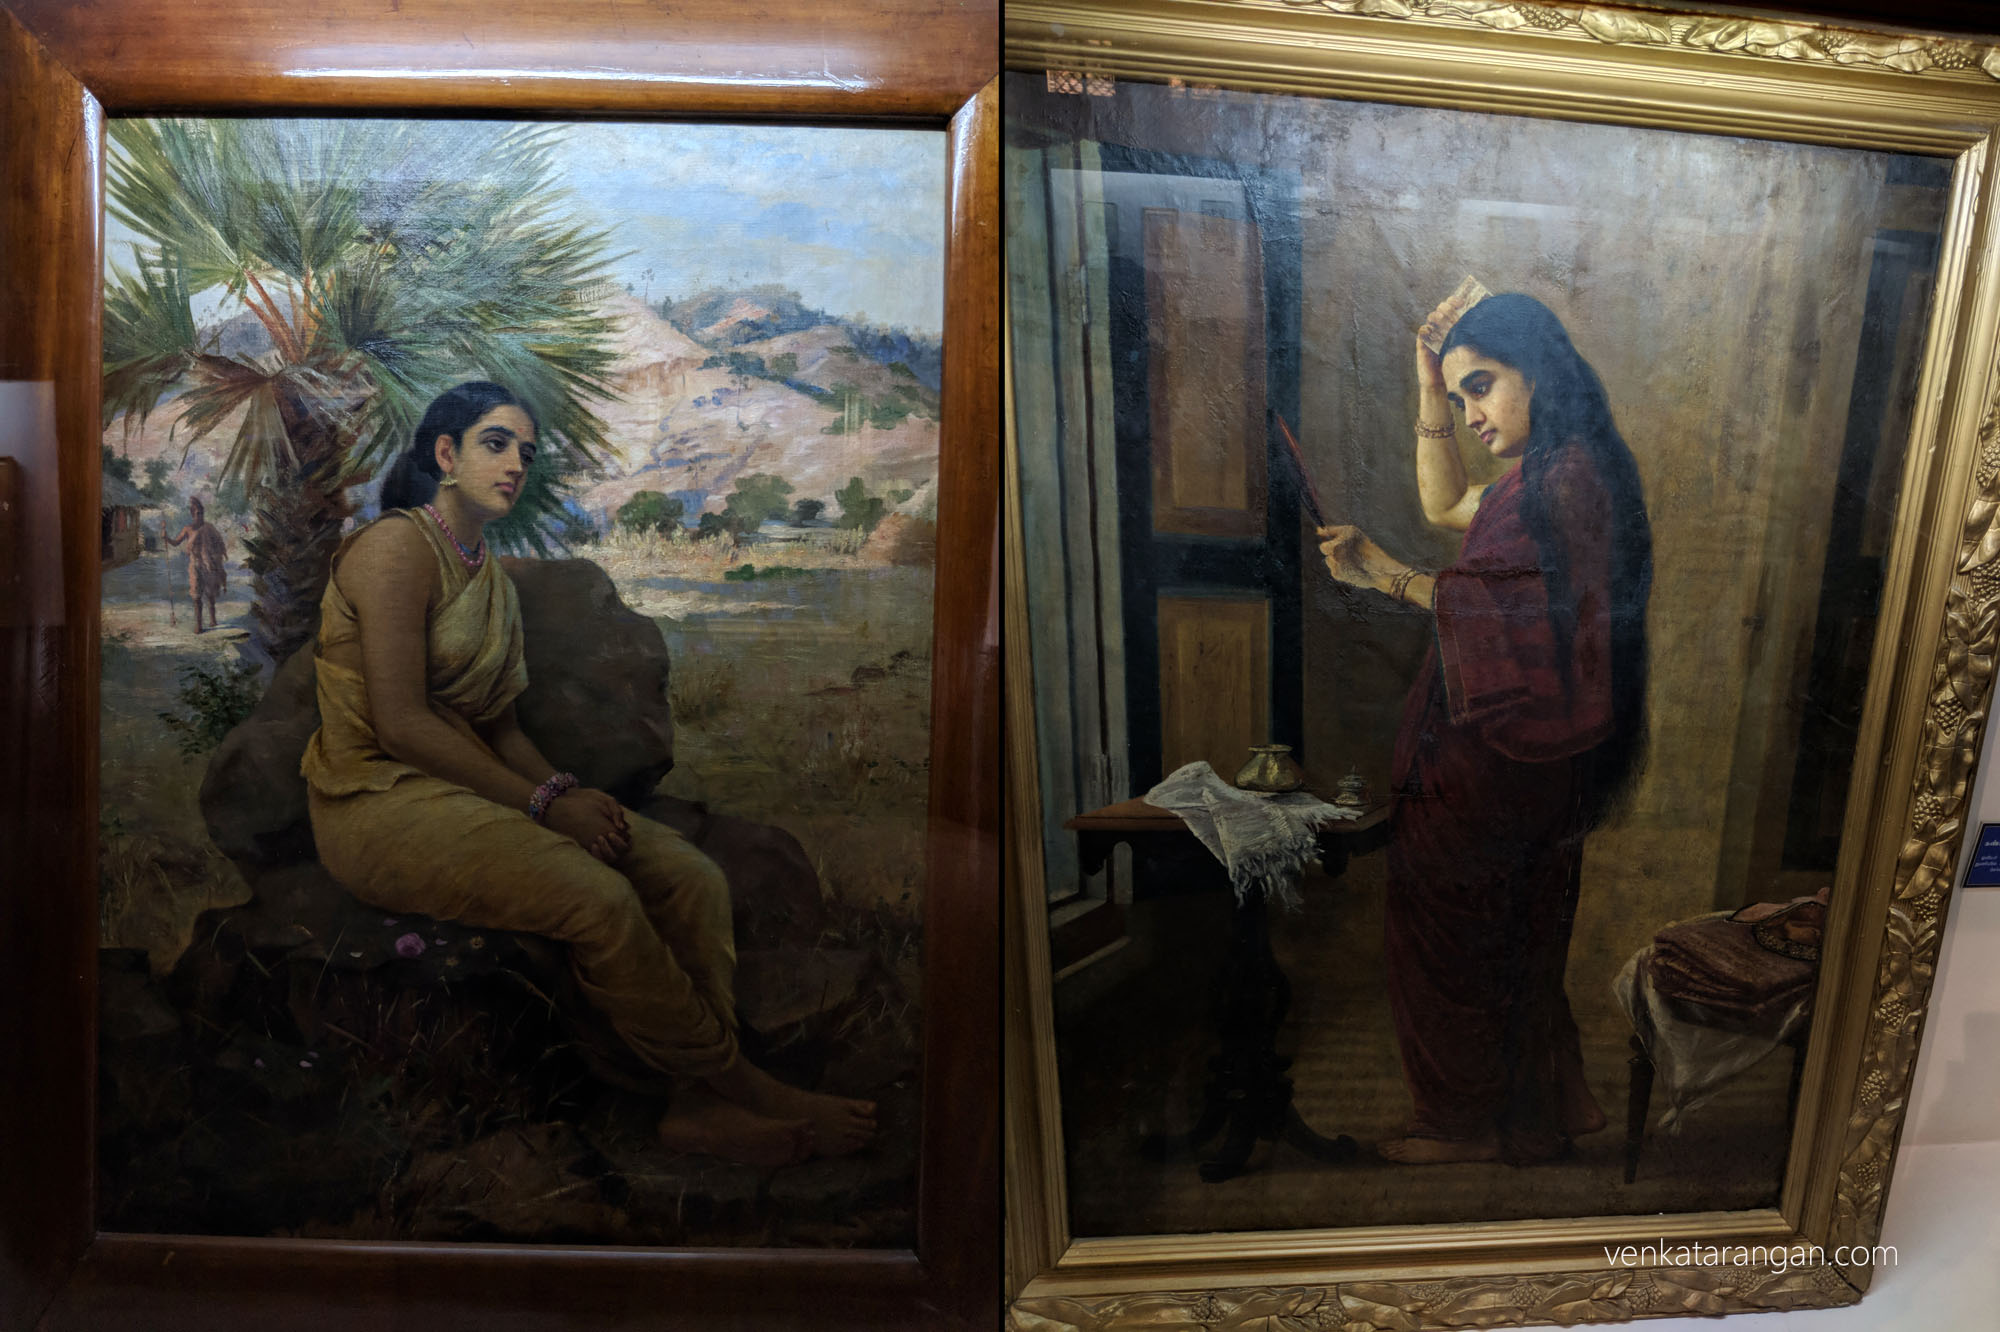 Left-Sakuntala (சகுந்தலா). Right-The Lady with a Mirror (1894)